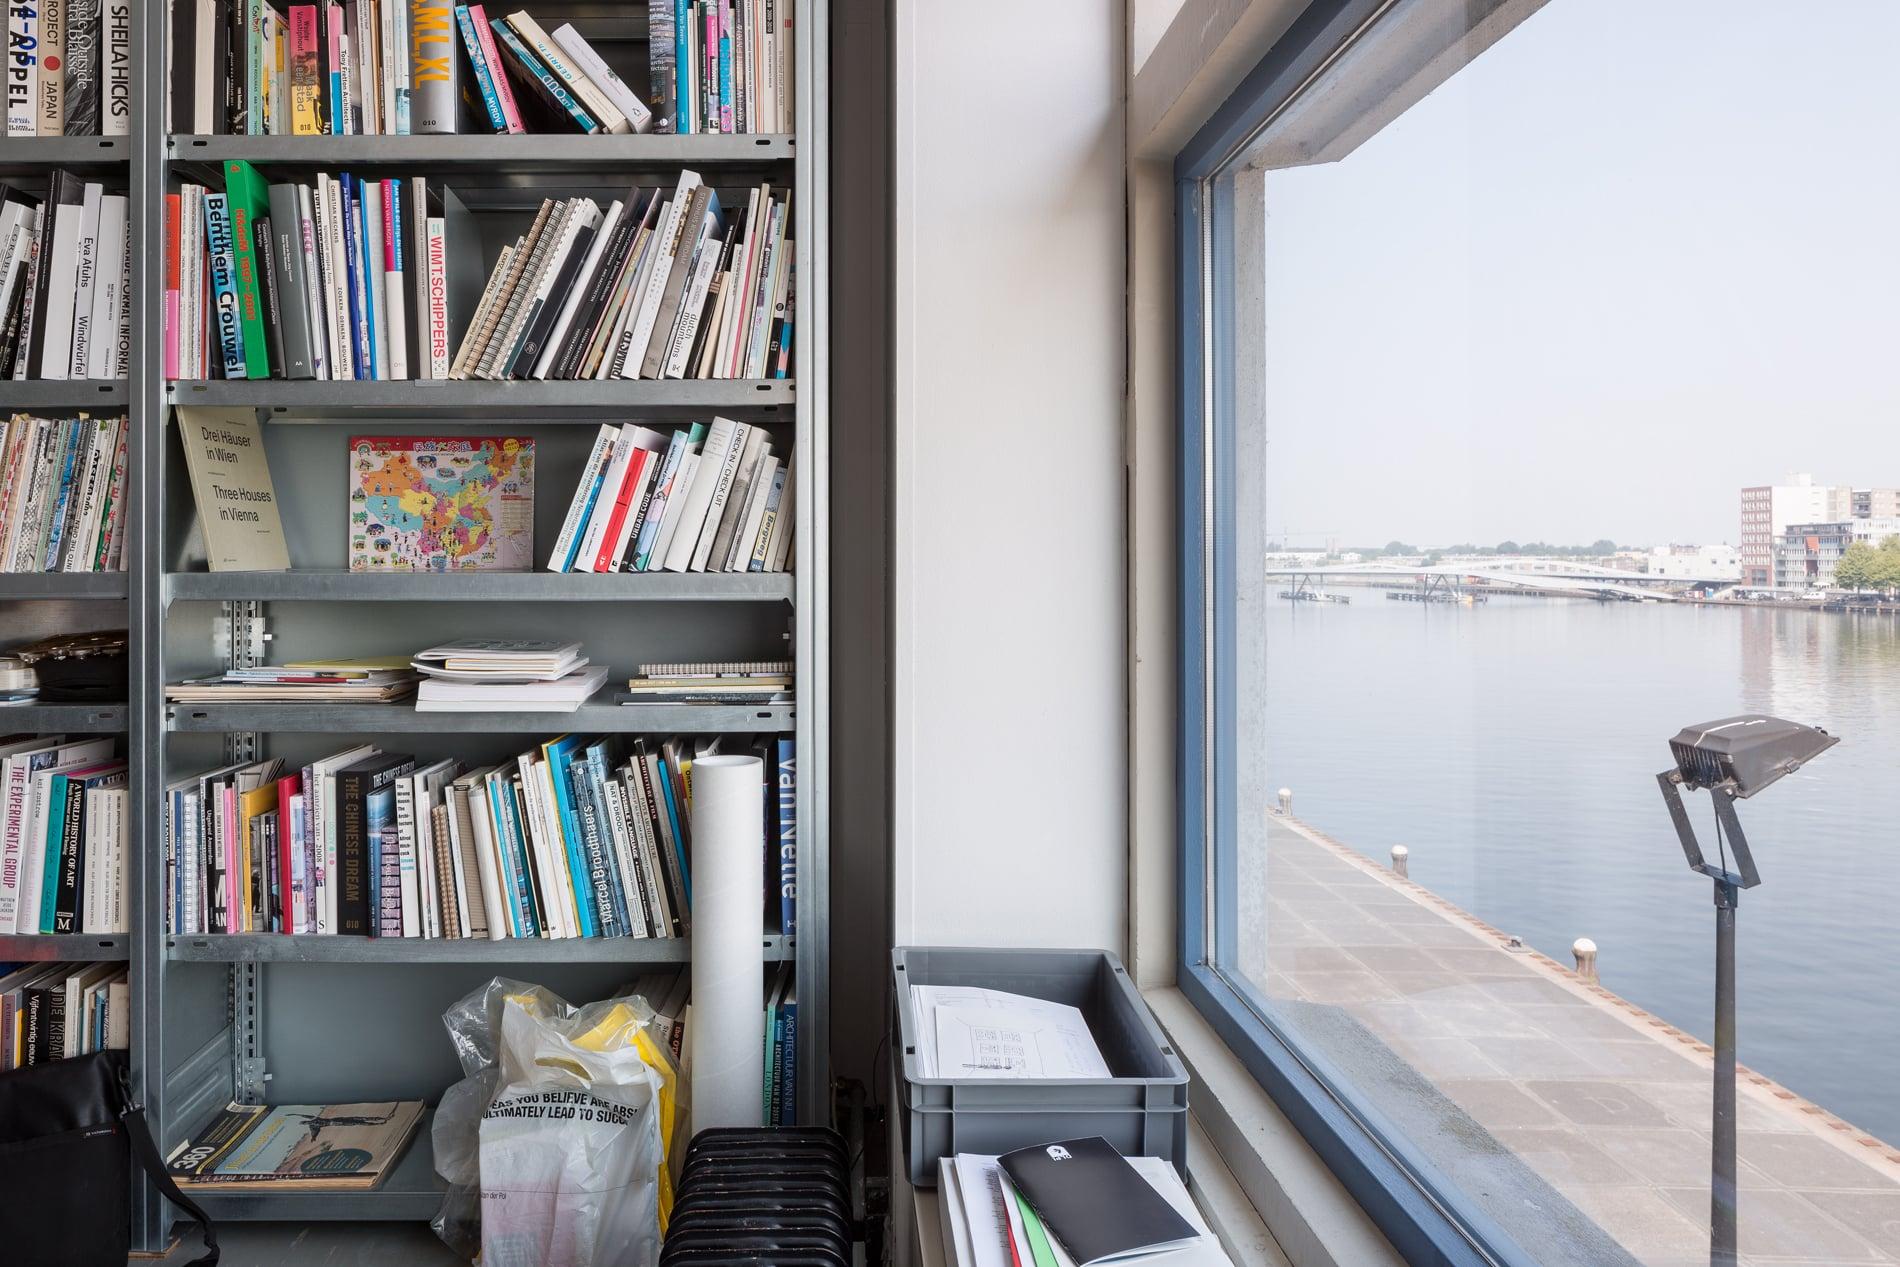 Studio Joost Grootens - Drei Häuser in Wien / Three Houses in Vienna